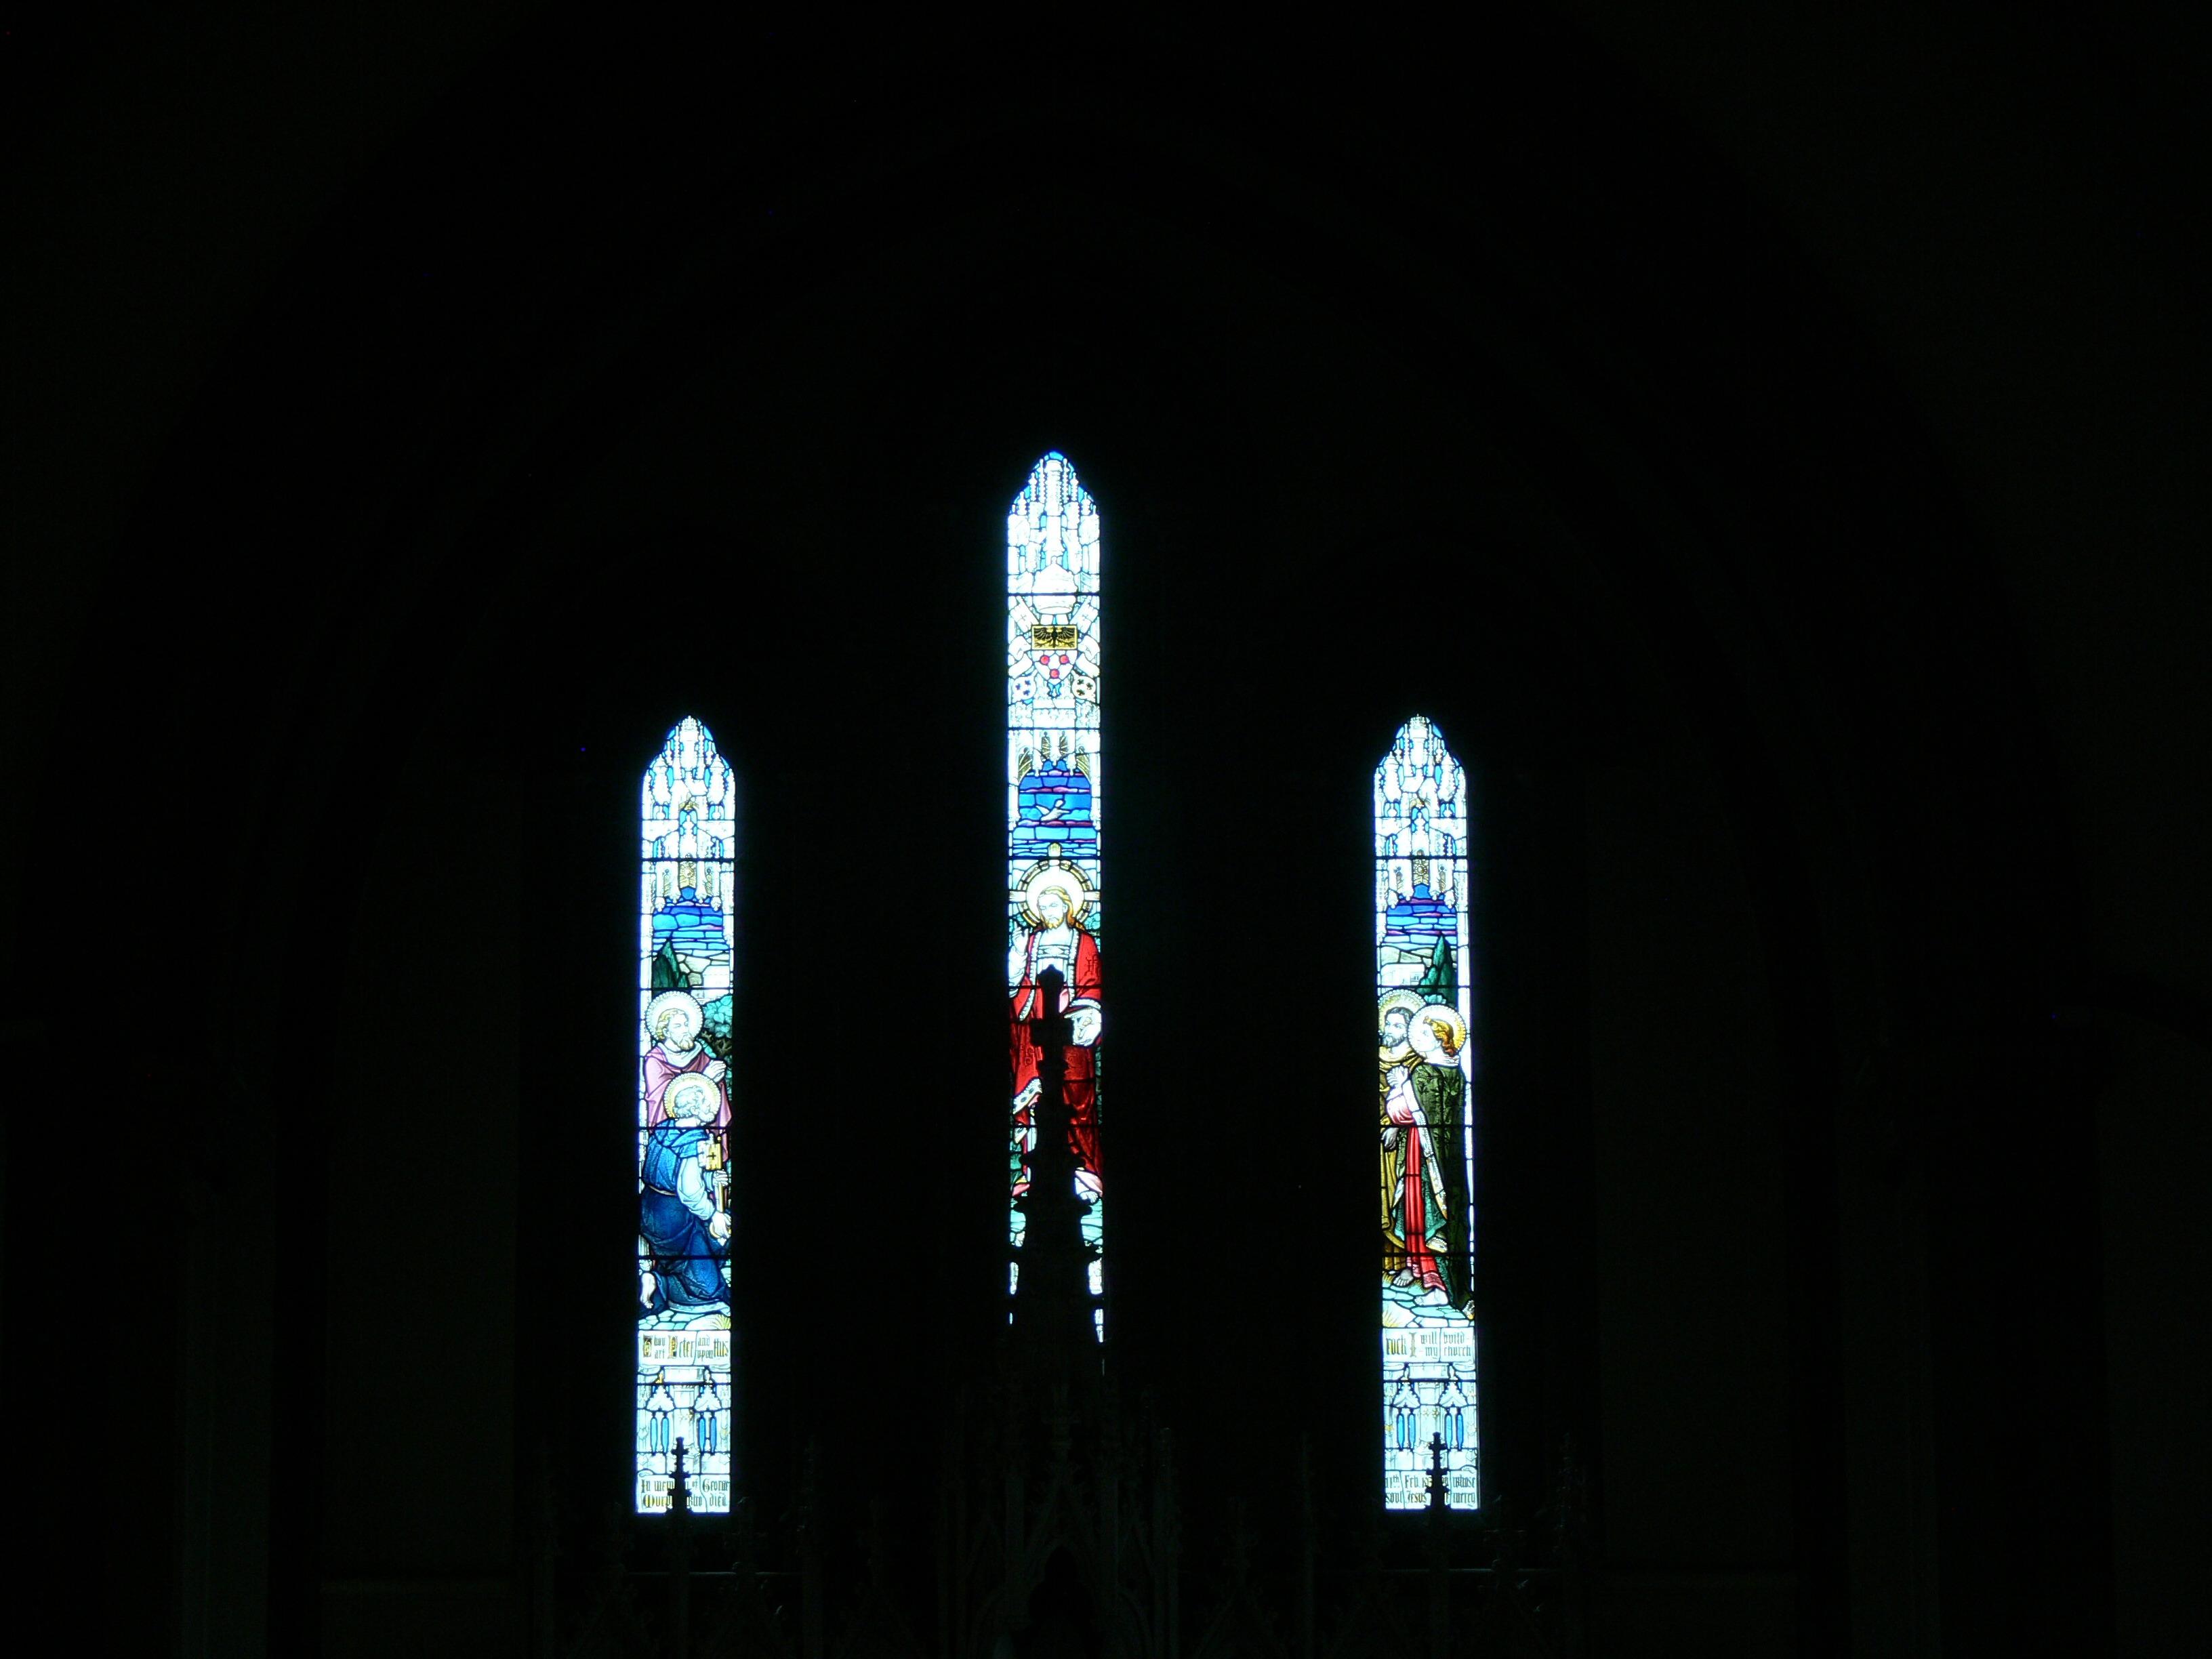 1 St Peter's Church 026